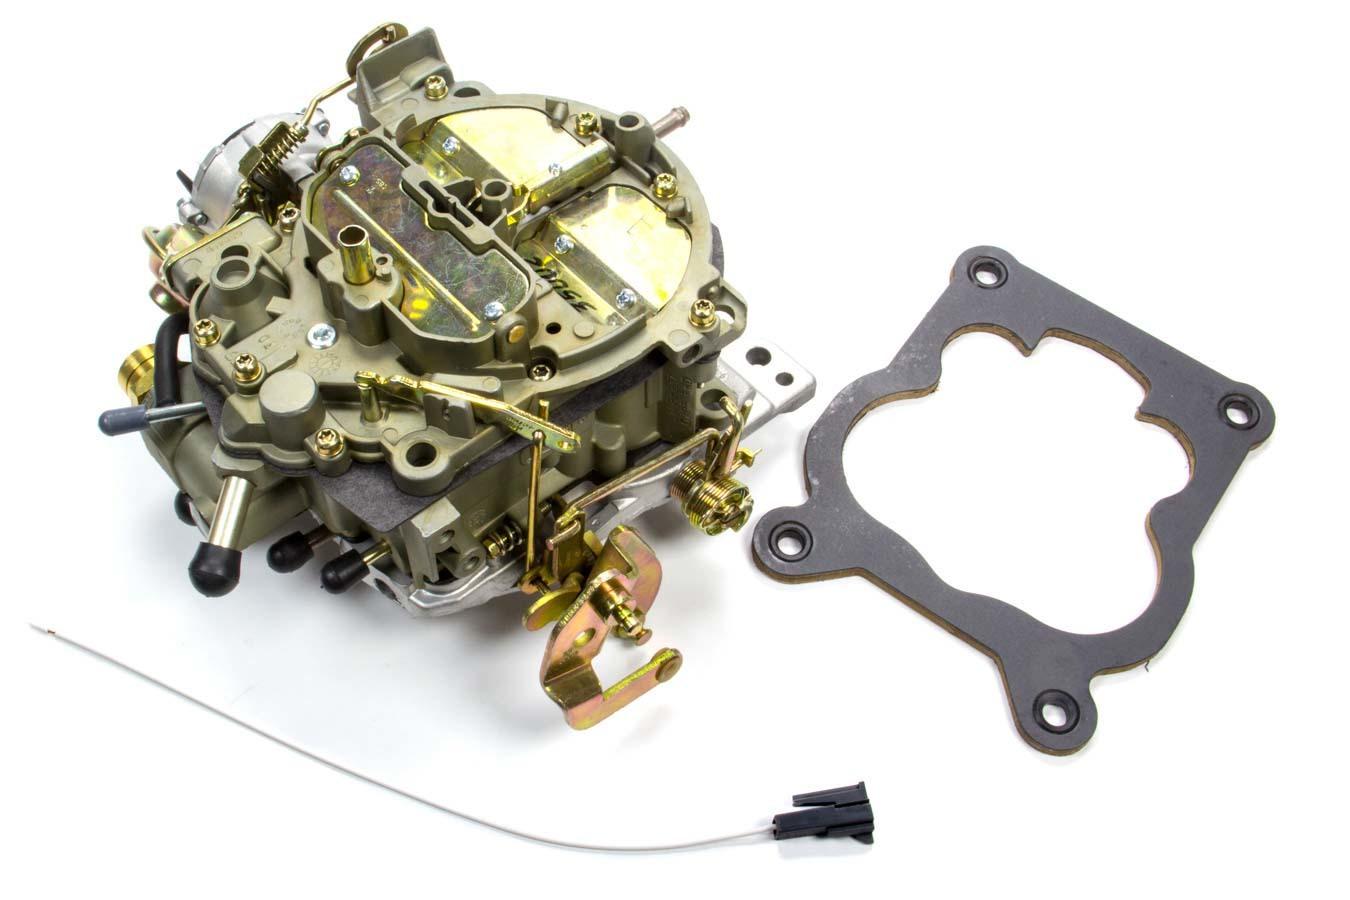 Quadrajet Stage 2 Carb 750 CFM